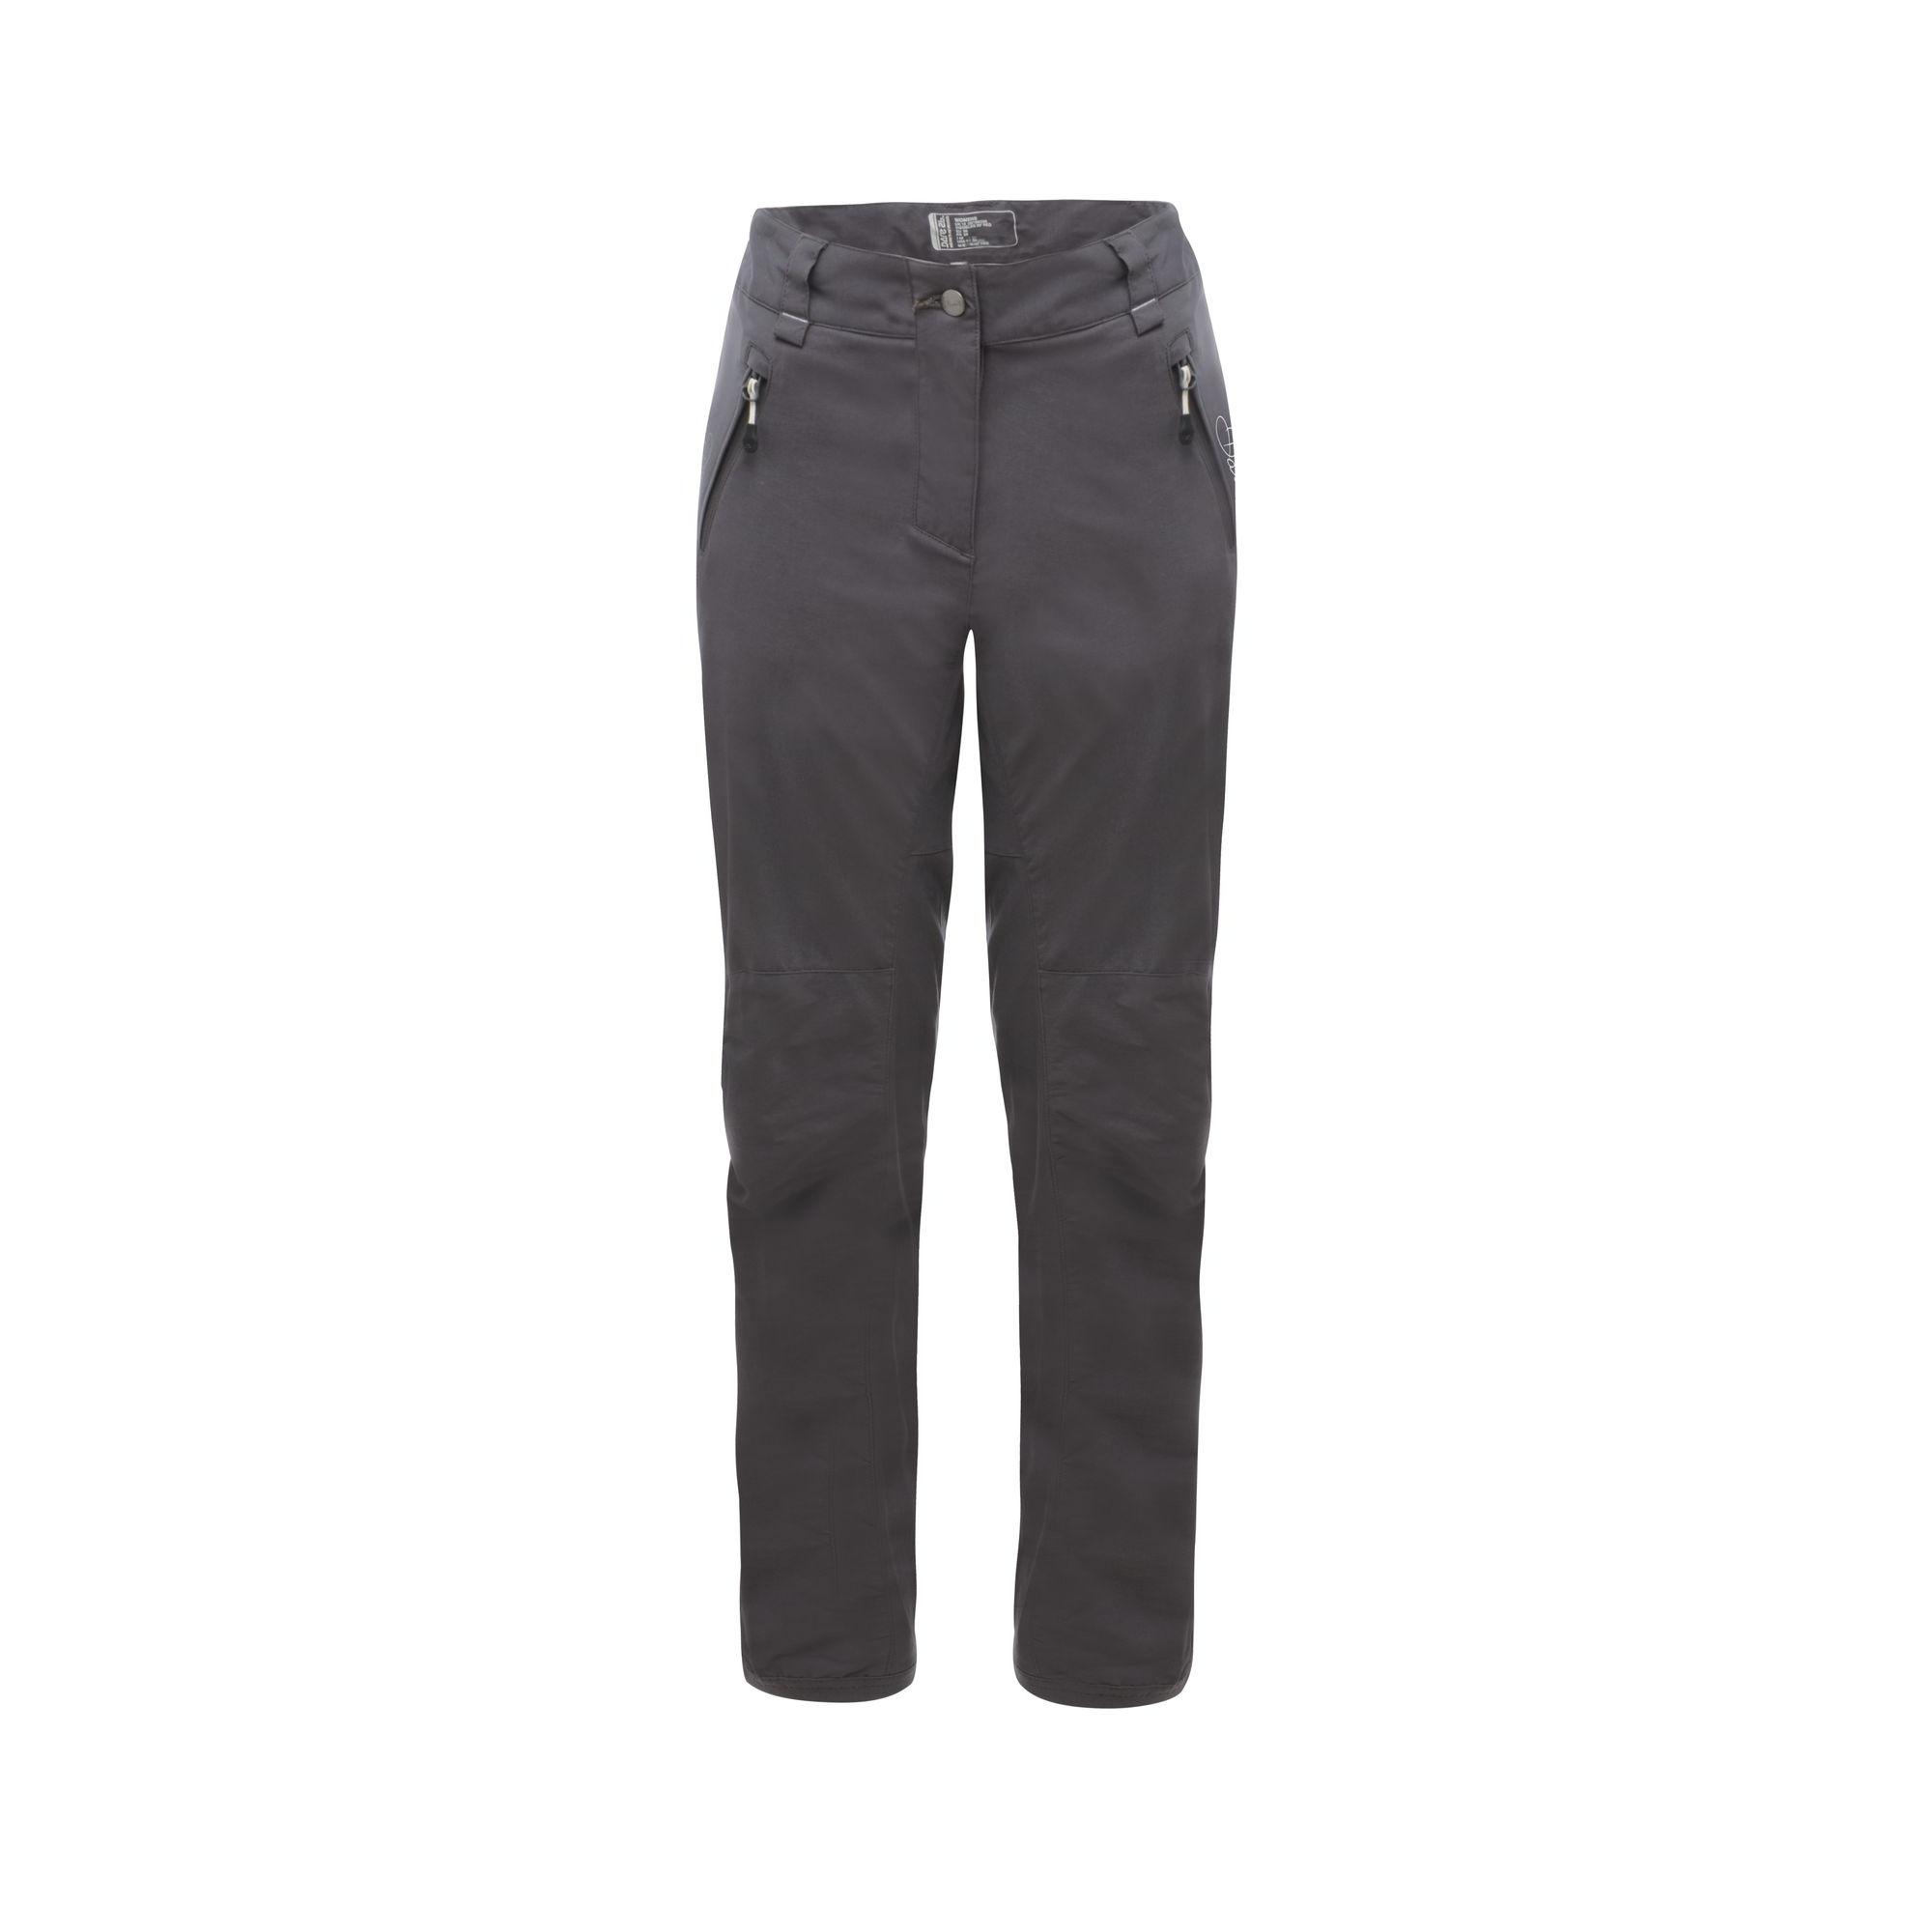 Dare 2B Womens/Ladies Melodic Hiking Trousers (20R) (Ebony Grey)